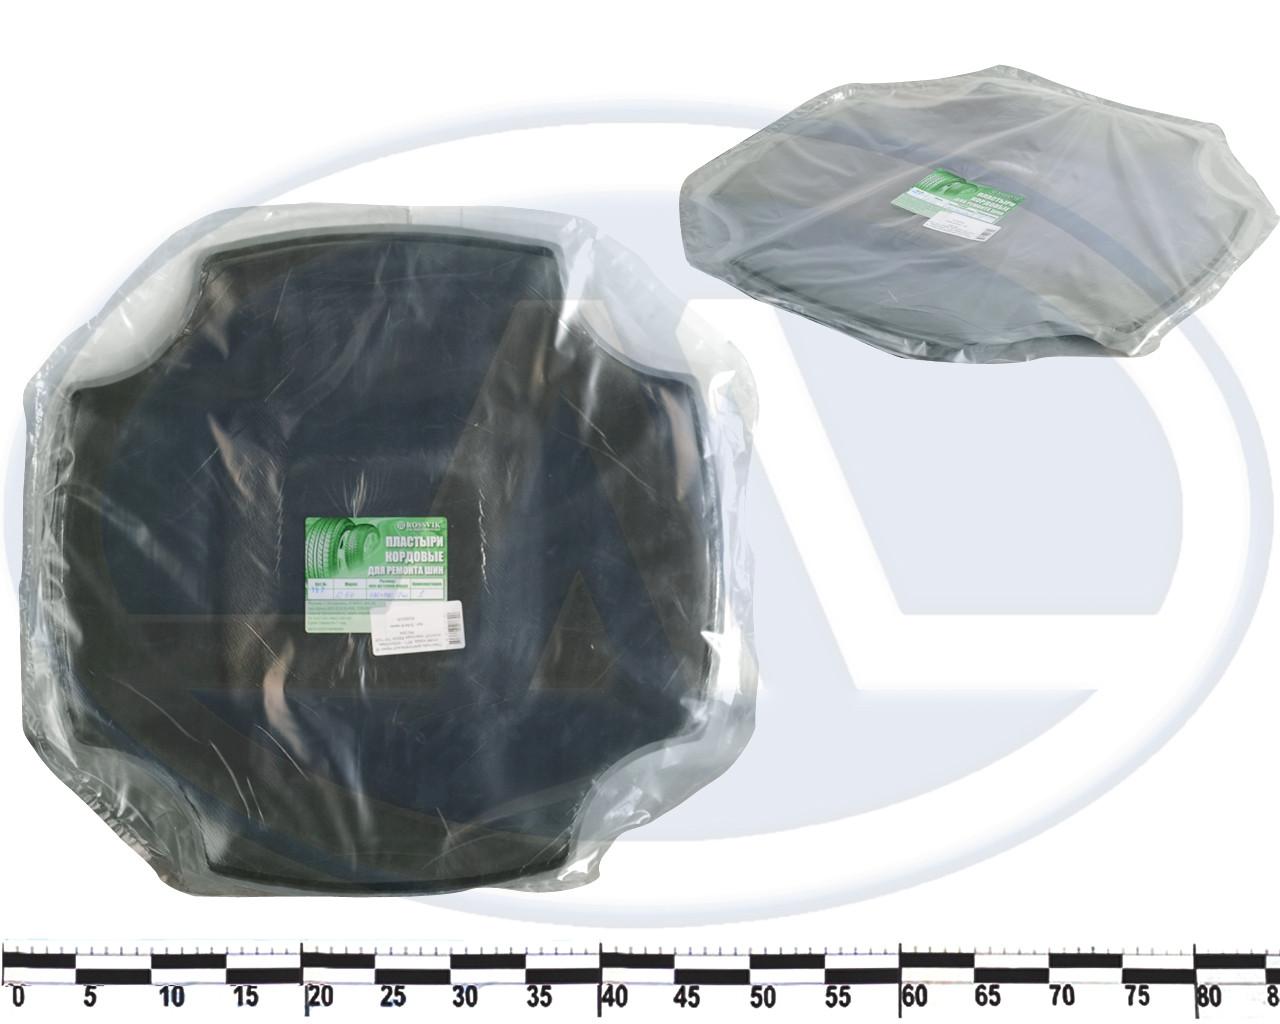 *Пластырь диагональный 430х430мм, 8 слоёв корда, 90° аналог Rema Tip Top PN 054